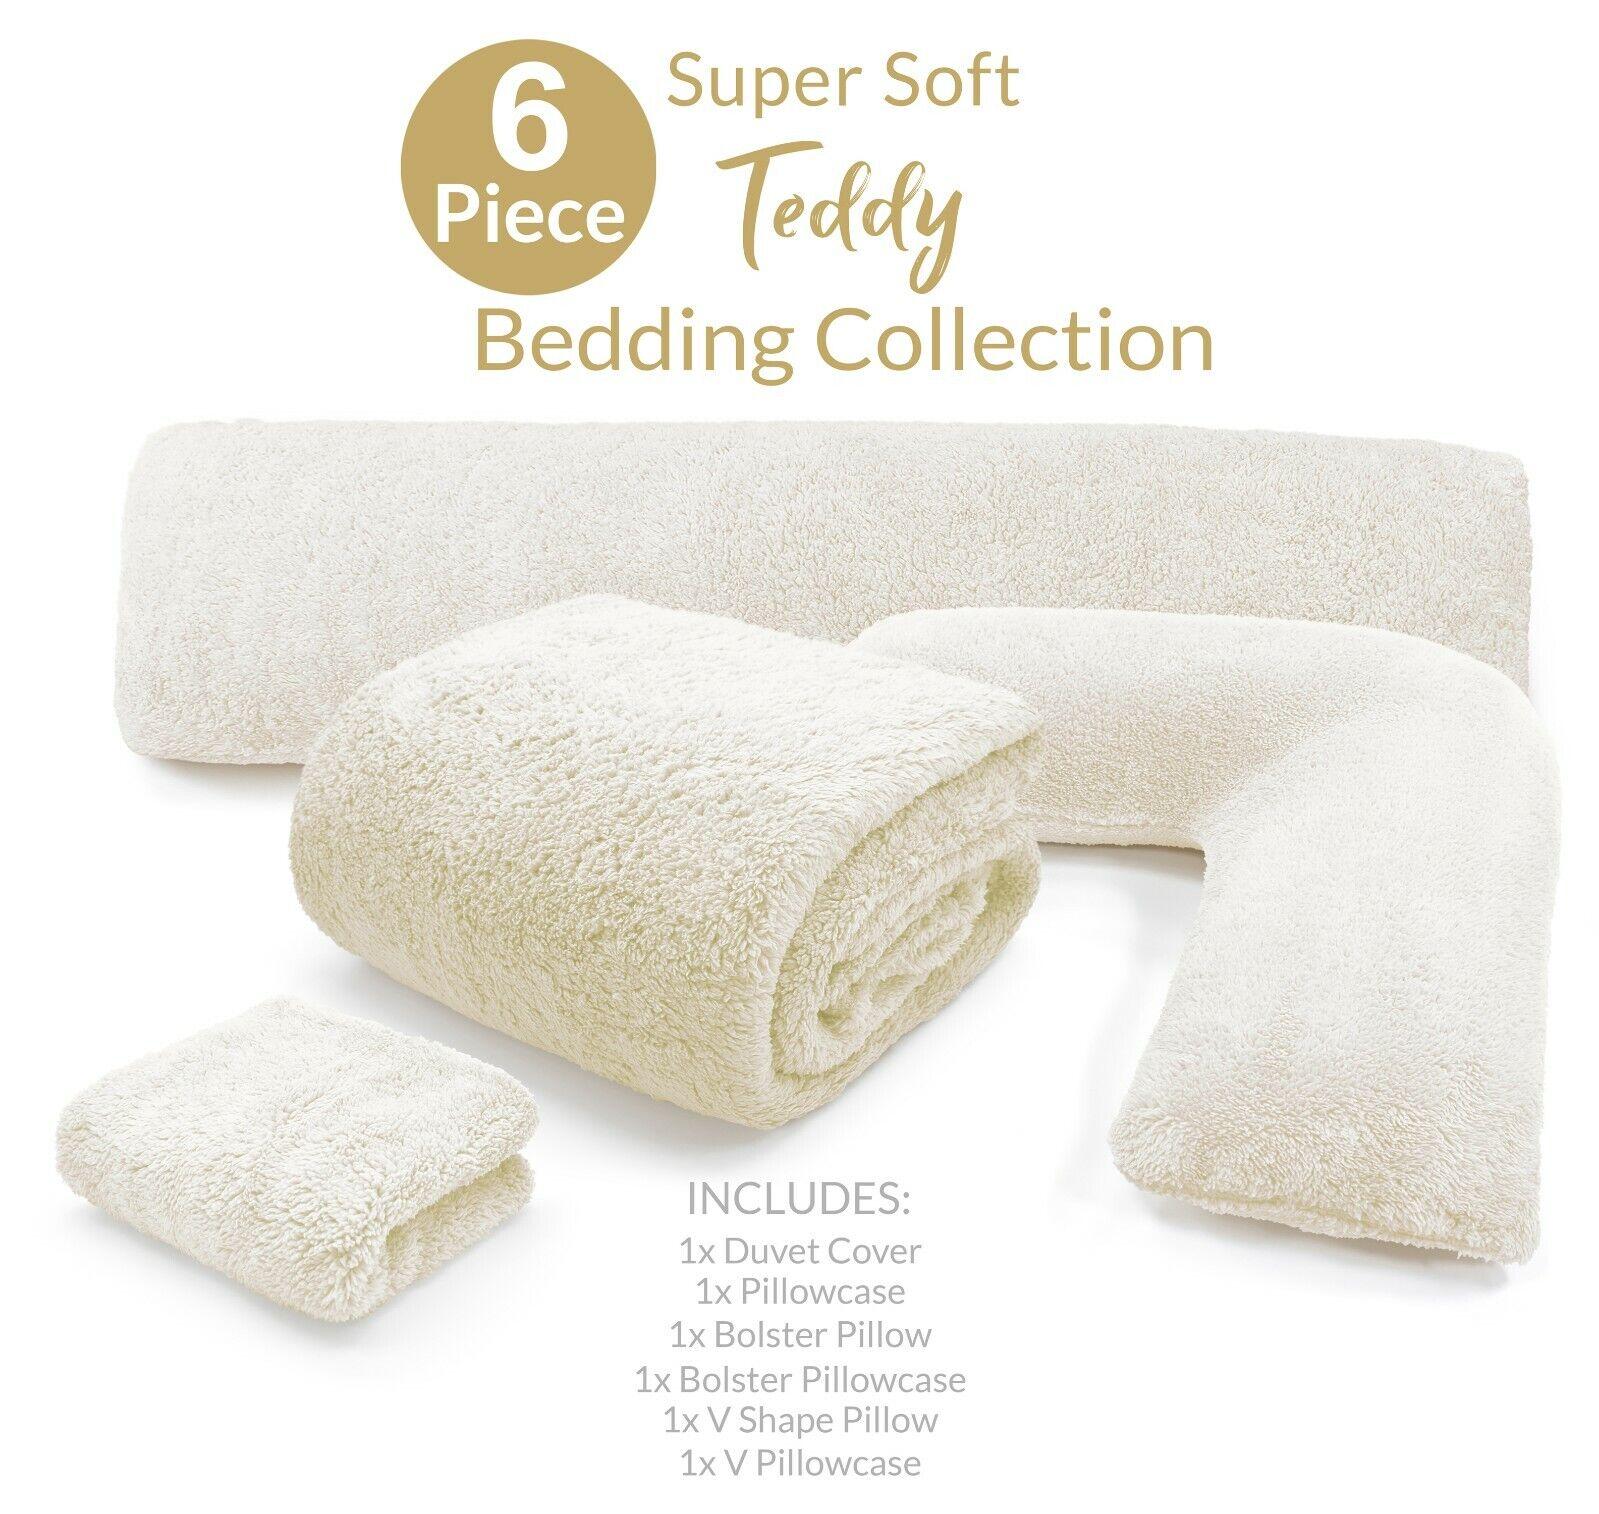 Student Essentials Moving to University Teddy Bedding Starter Cream Set